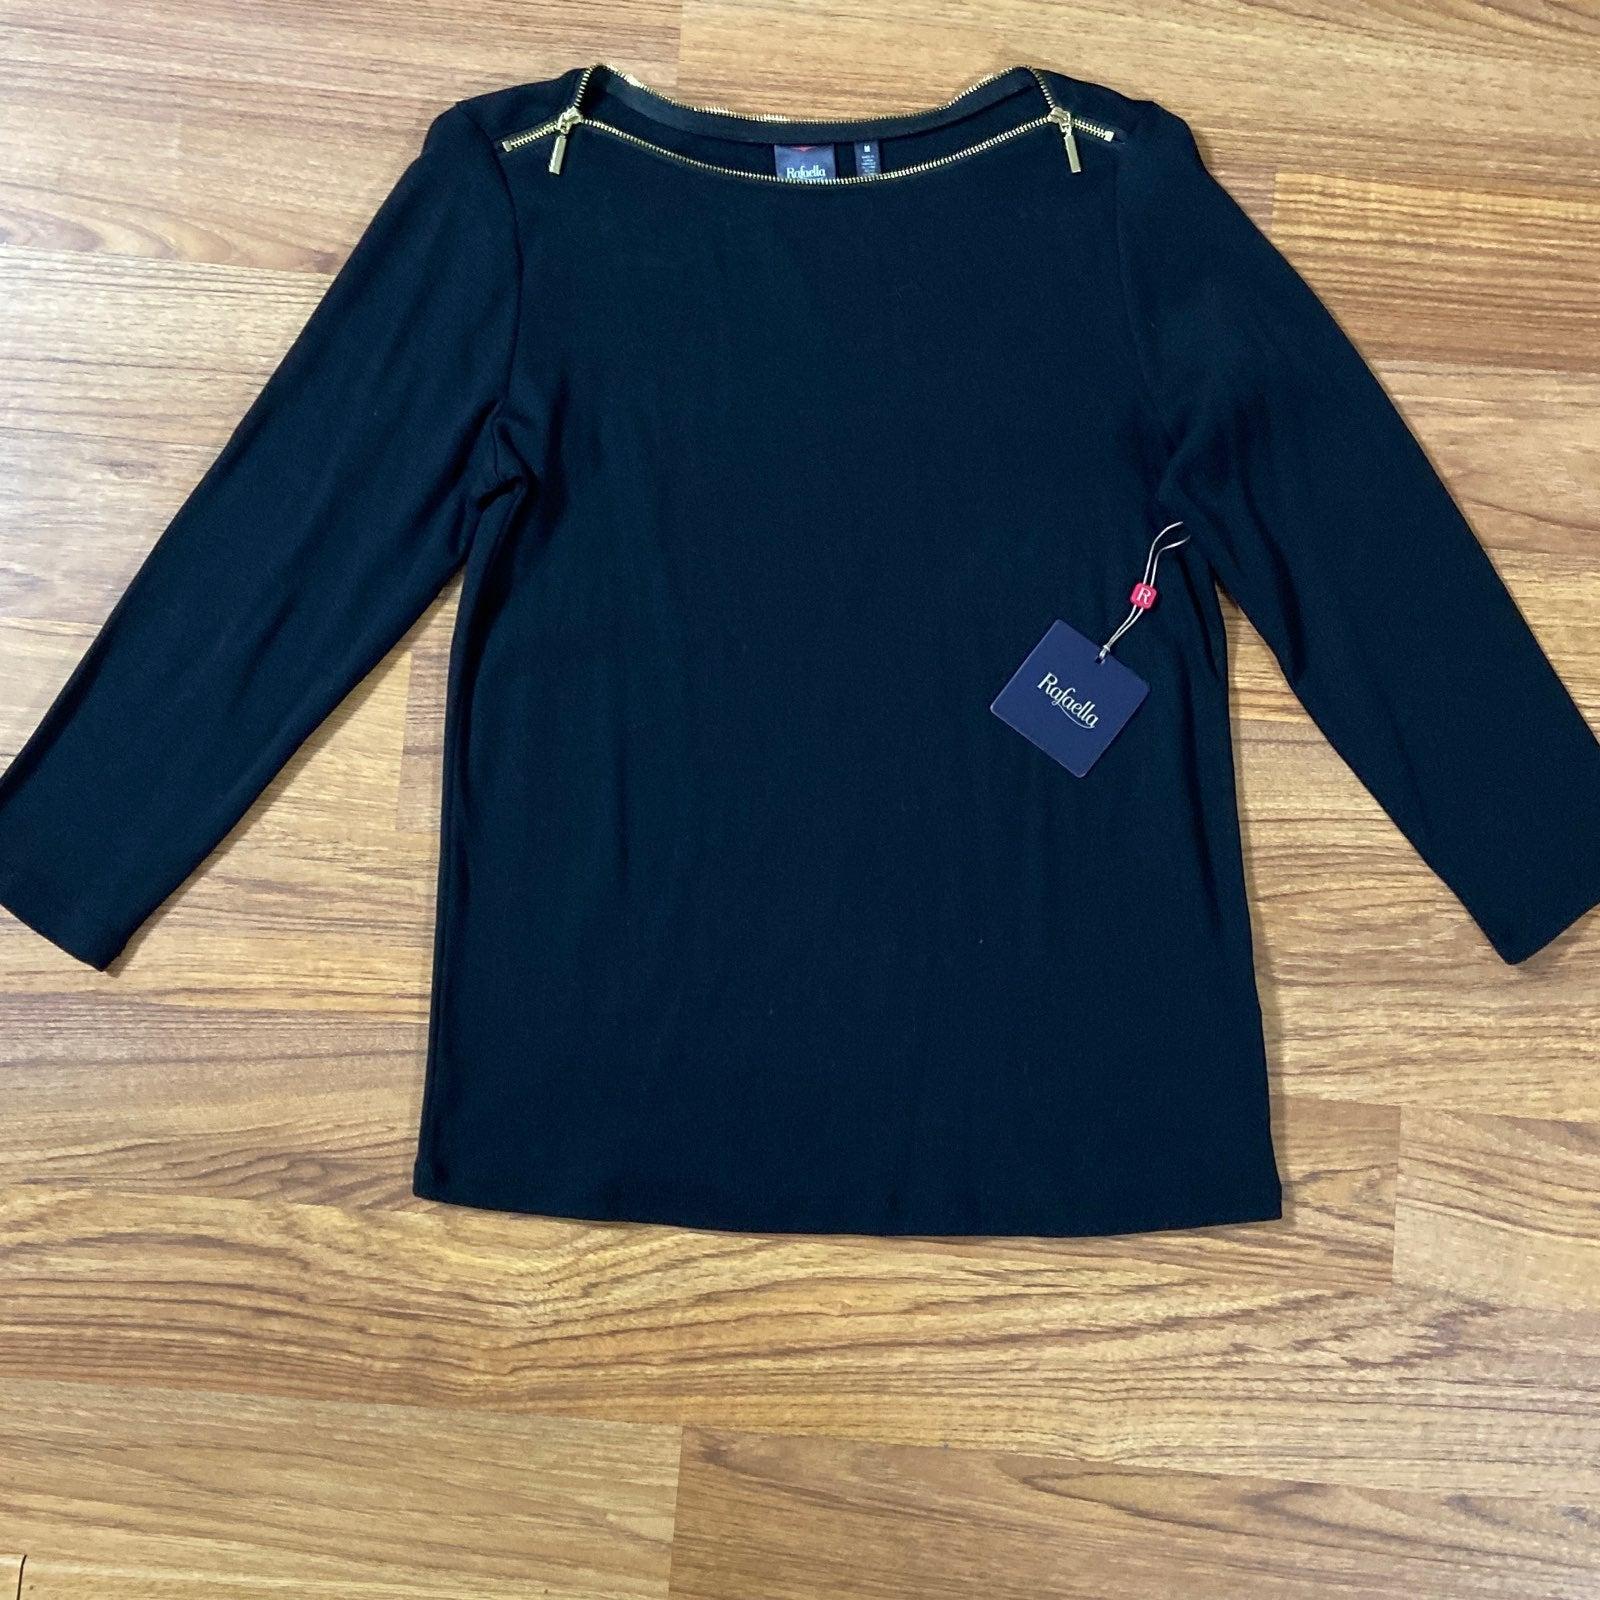 Women's black top with gold zipper